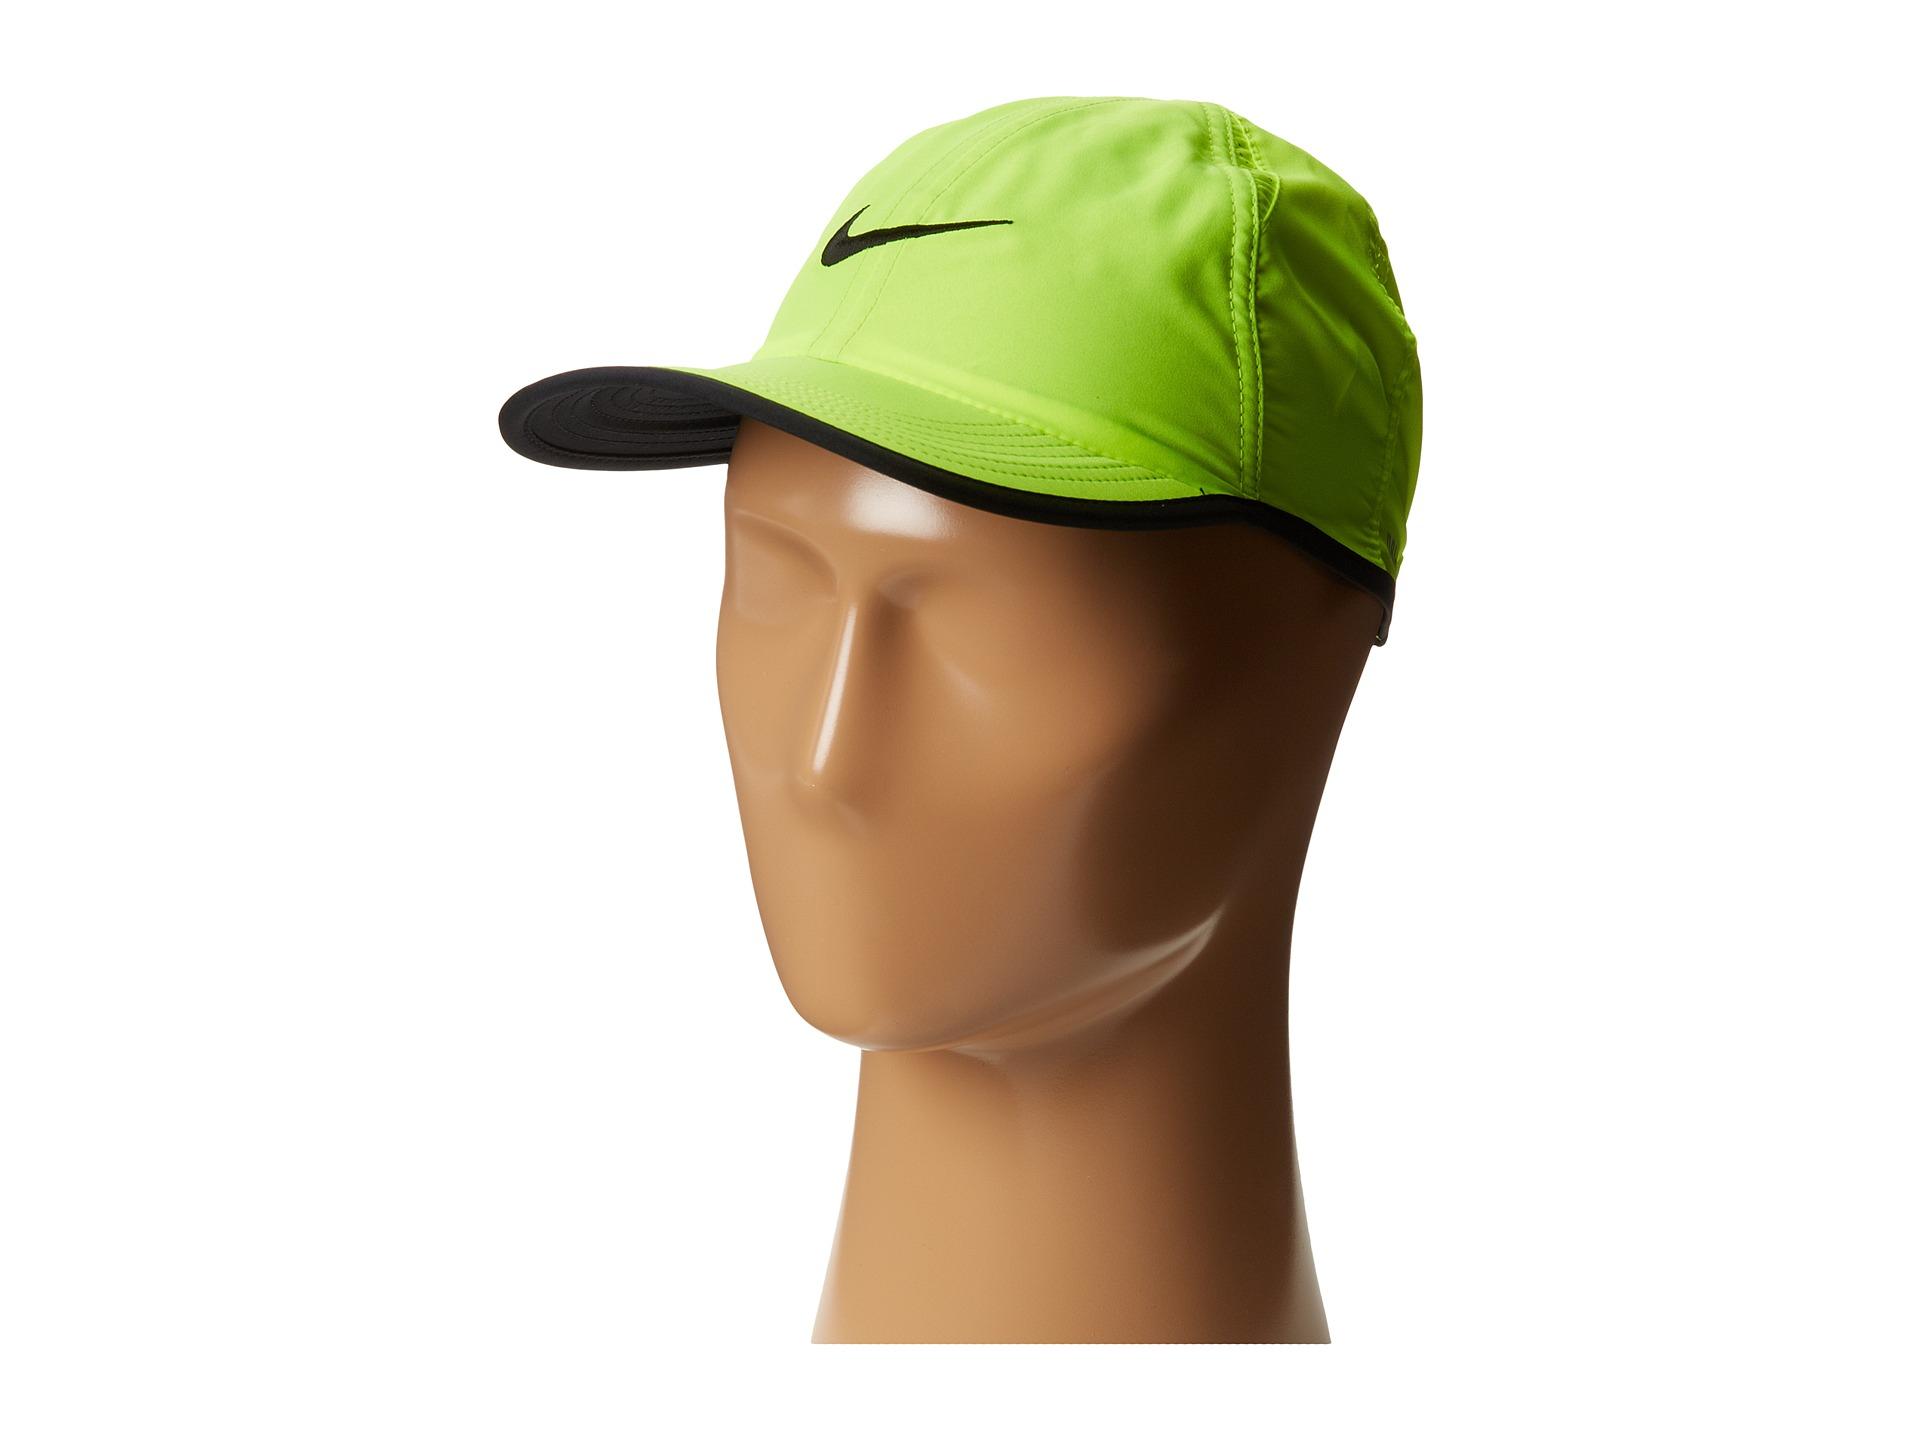 Lyst - Nike Featherlight Adj Cap Youth in Black 9b5031e4361